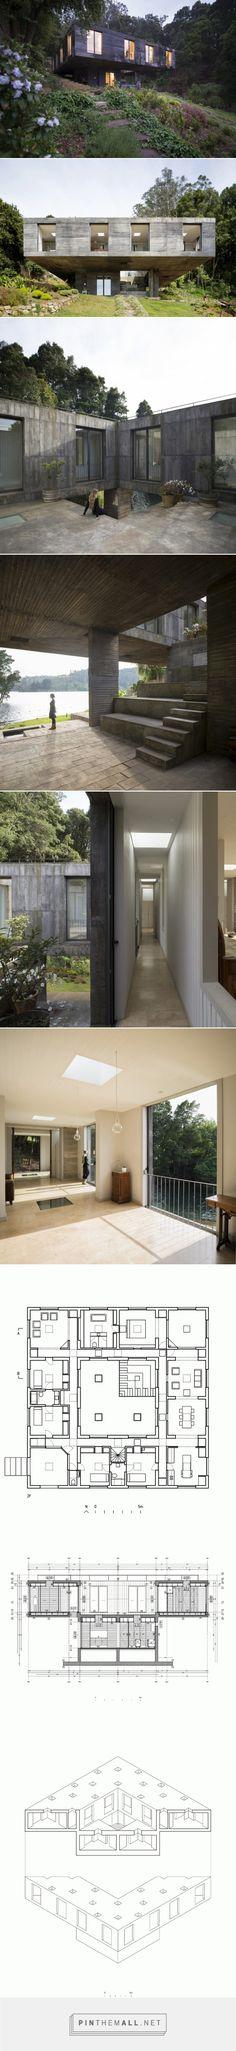 Guna House / Pezo von Ellrichshausen | ArchDaily. Concrete.